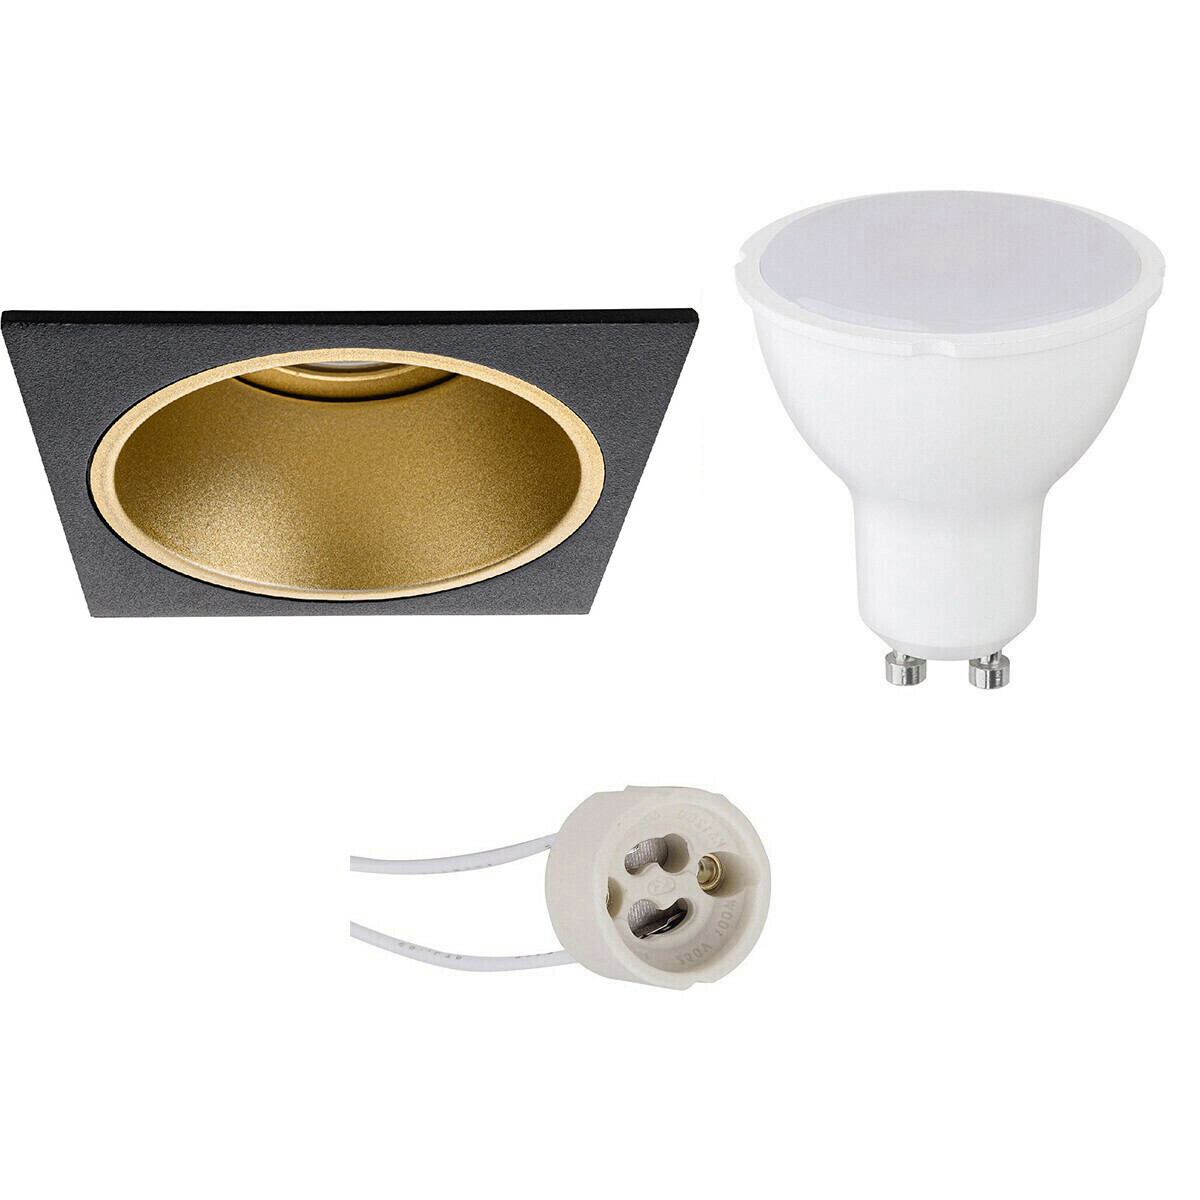 LED Spot Set - Aigi - Pragmi Minko Pro - GU10 Fitting - Inbouw Vierkant - Mat Zwart/Goud - 6W - Warm